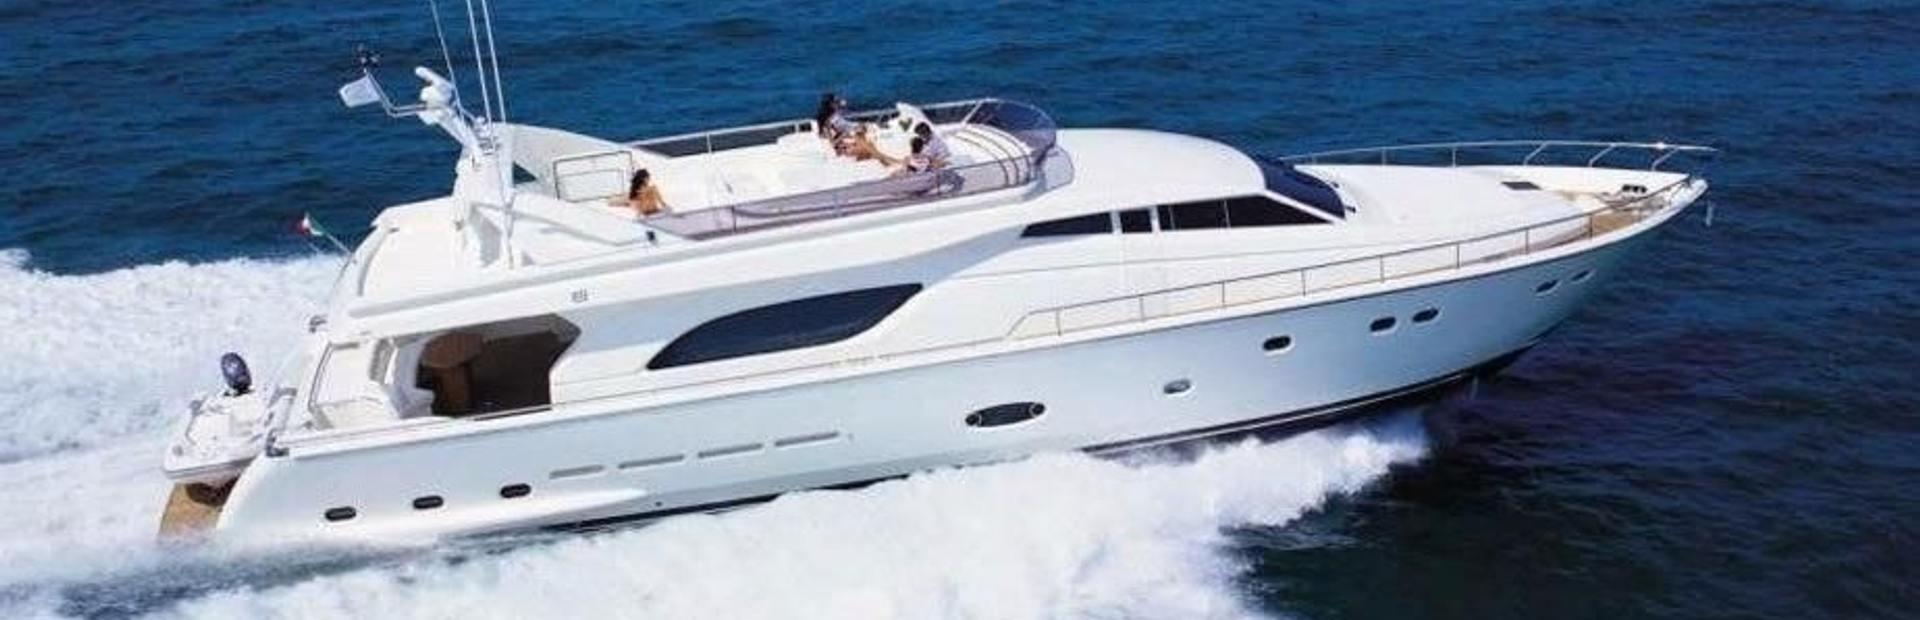 Ferretti Yachts 810 Yacht Charter